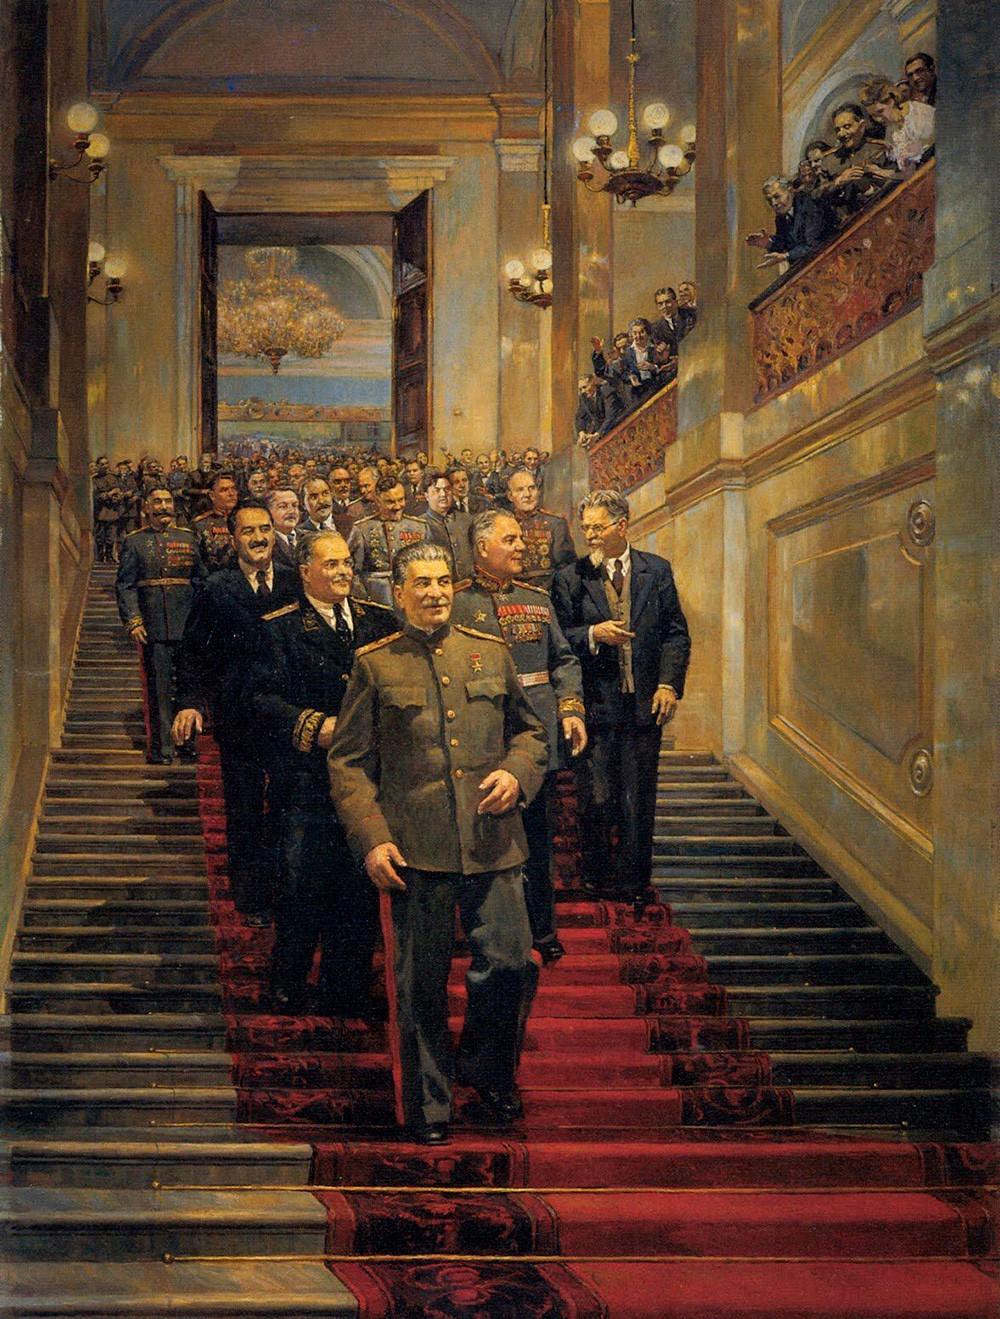 Lukisan karya Dmitry Nalbandyan berjudul